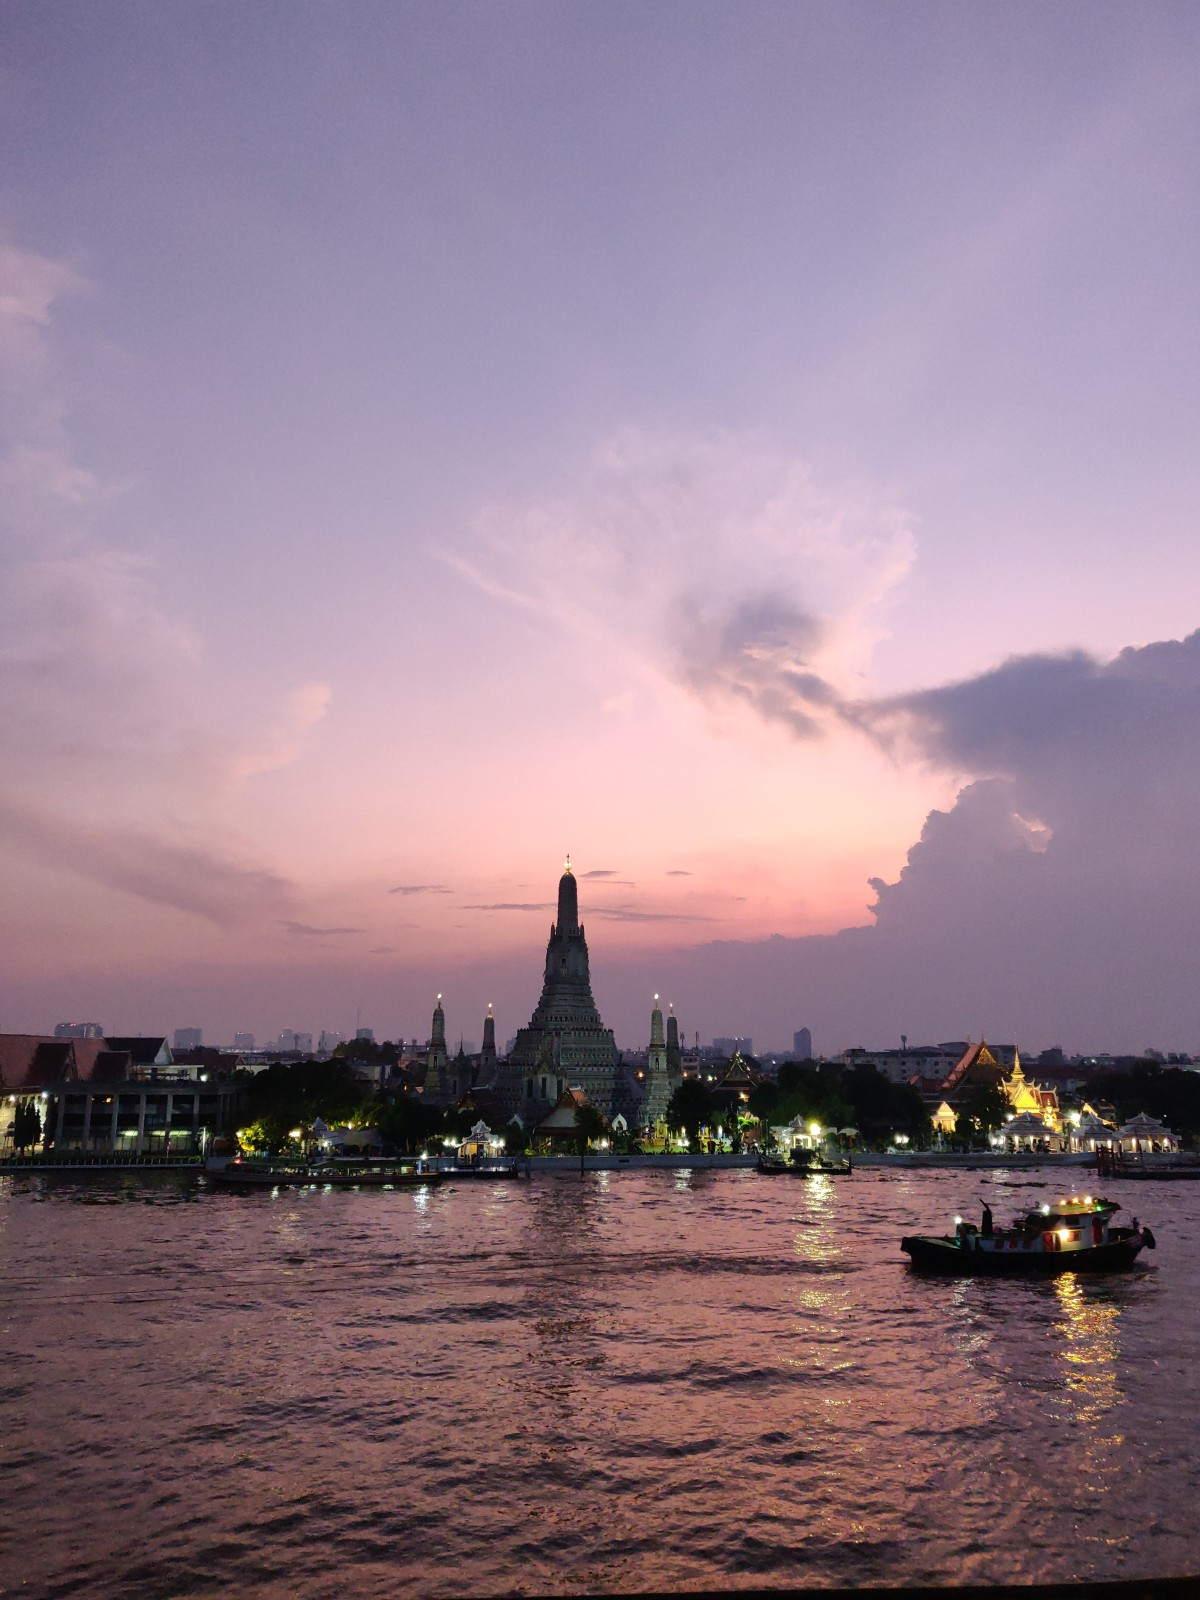 Sunset by Chao Phraya river